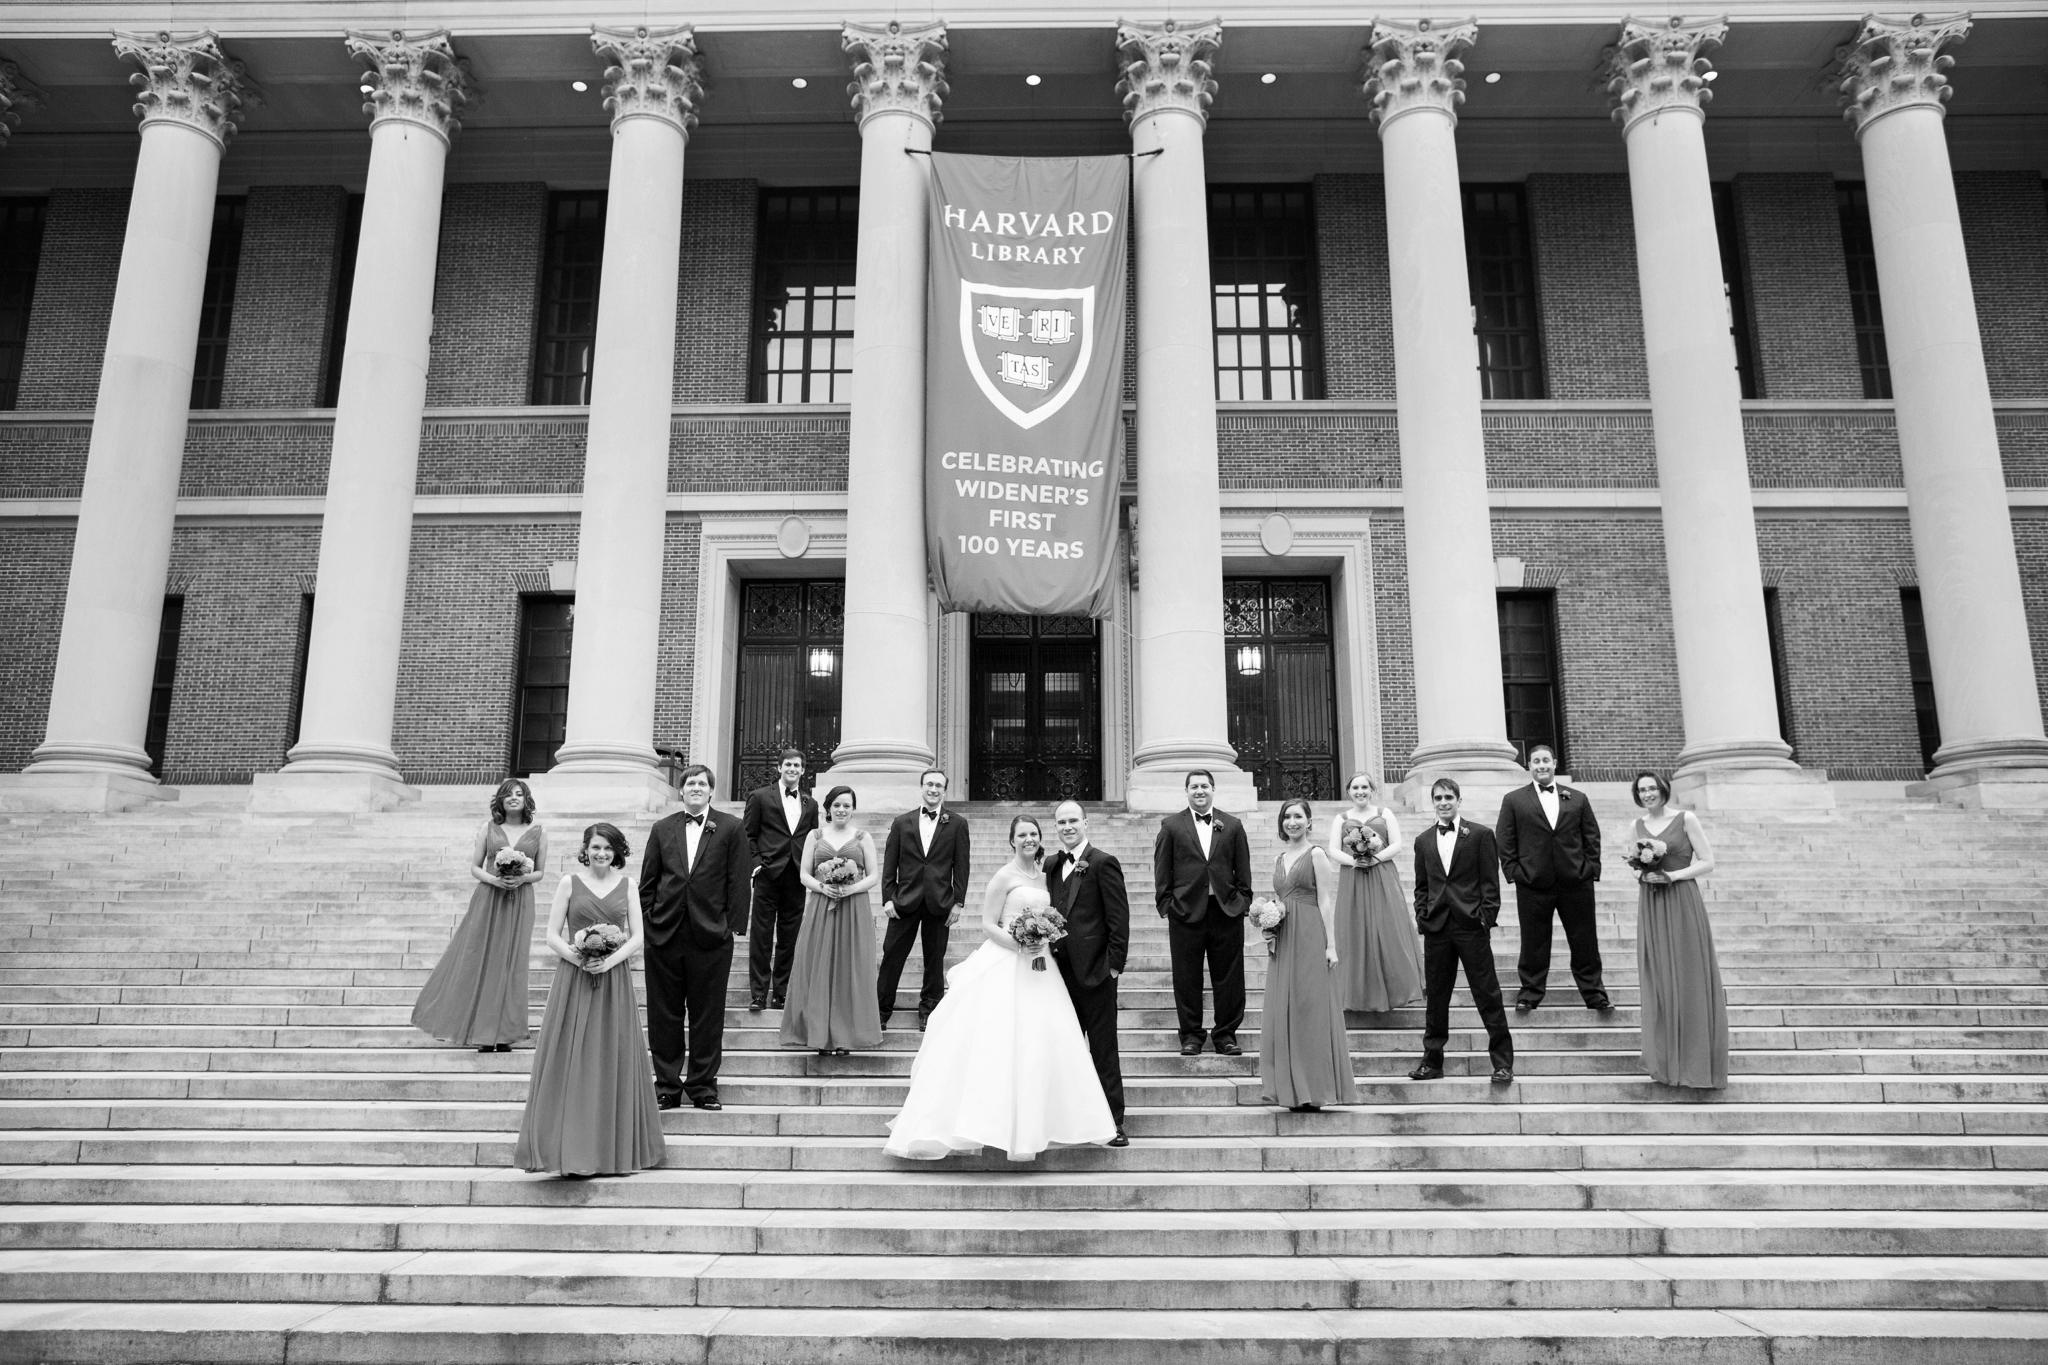 HarvardFacultyClubWedding_BostonMAFallWedding_MichelleGirardPhotography34.jpg